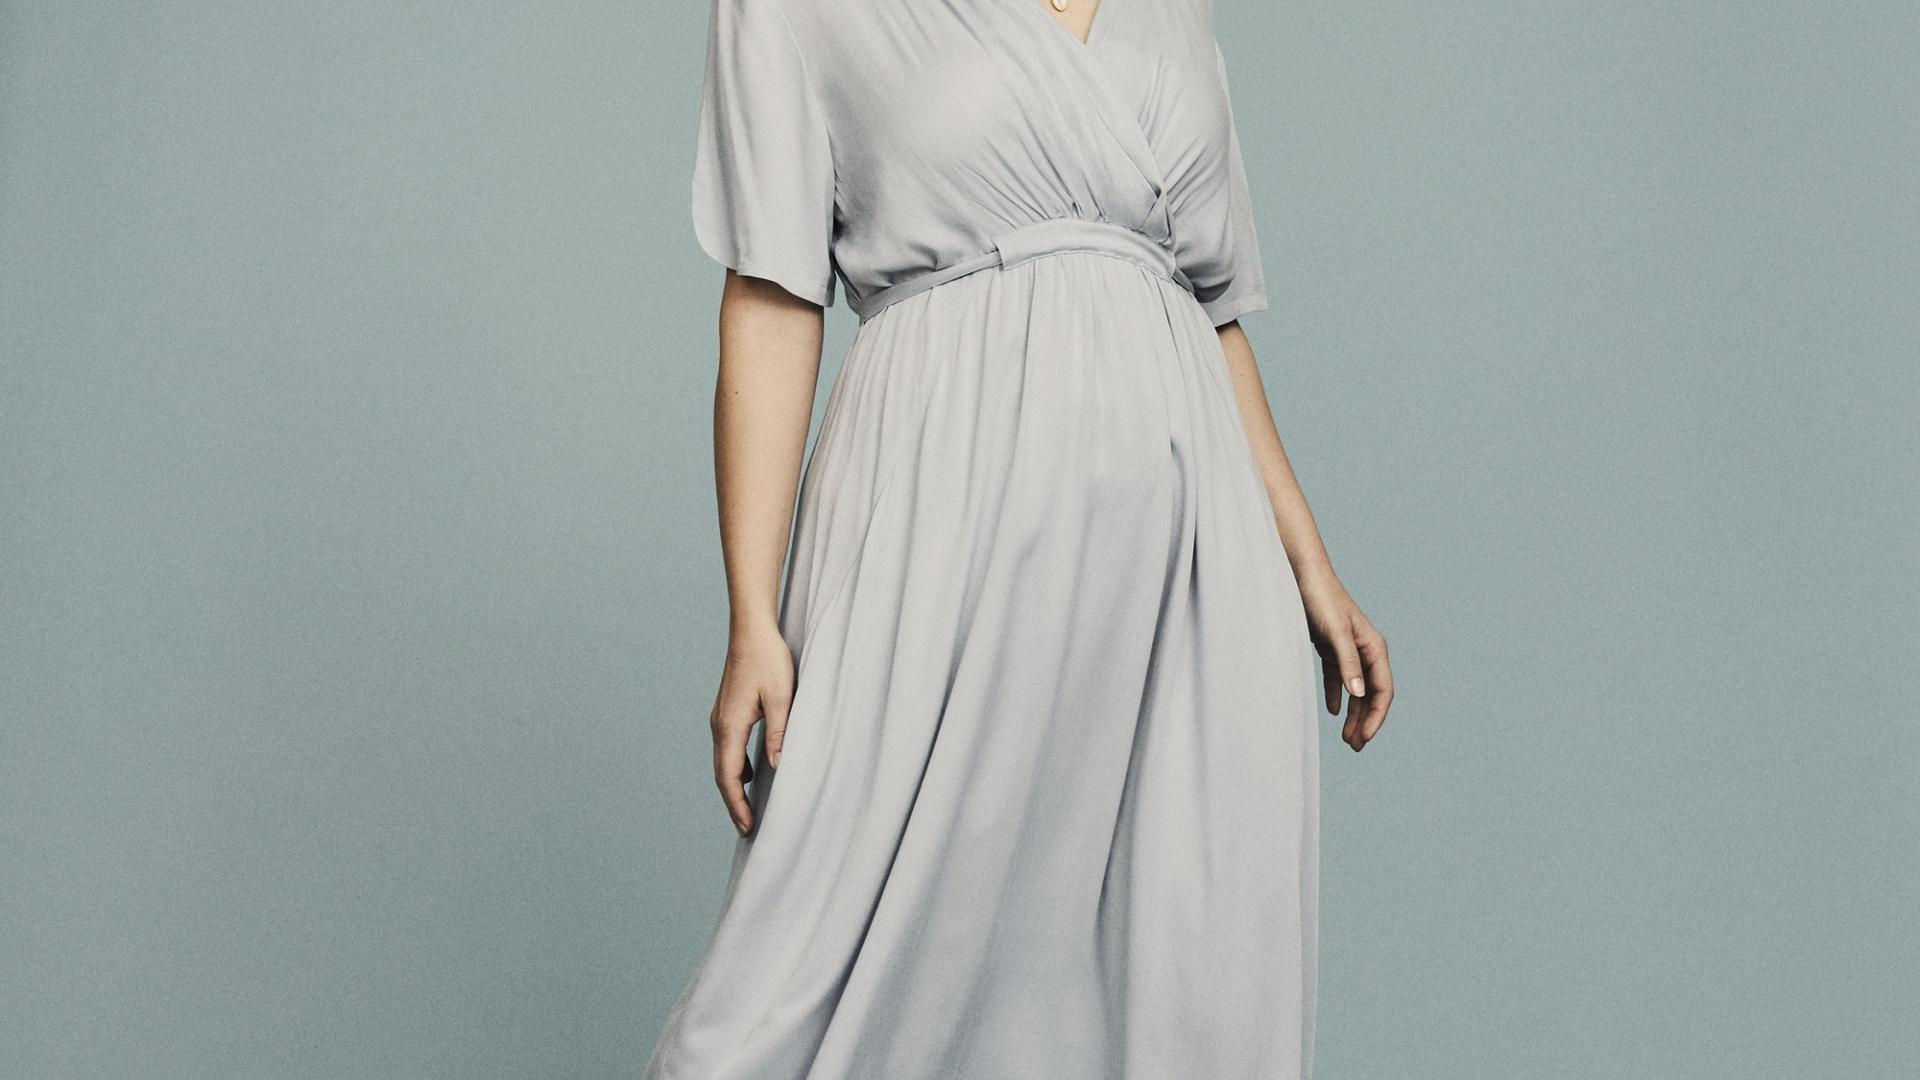 Junarose Plus Size Vero Moda SS Collection 2020